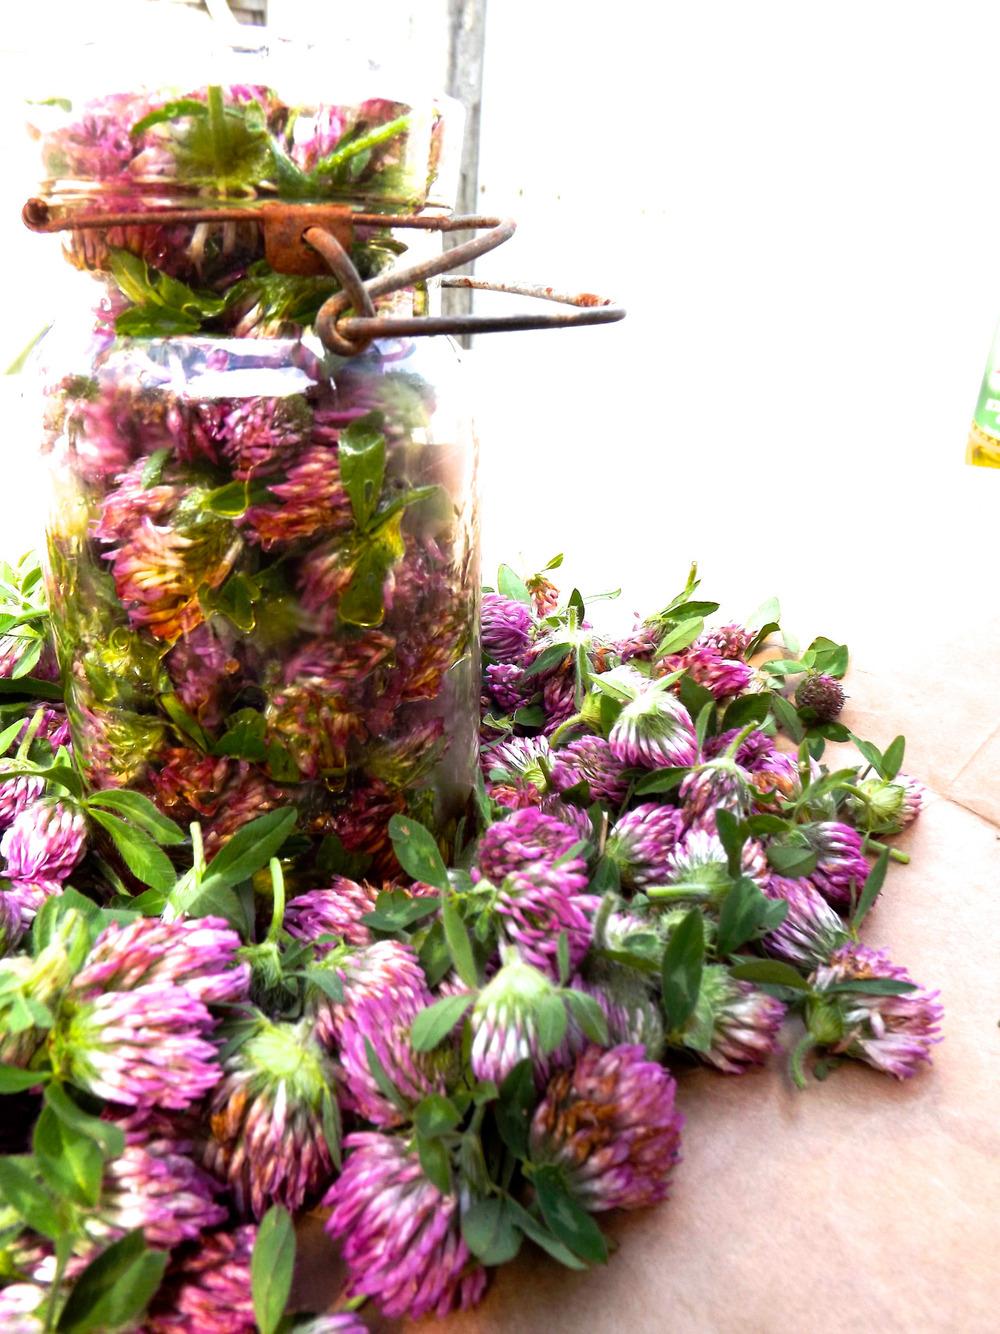 good4youherbals :      red clover blossom love . such good tea + tincture wild medicine